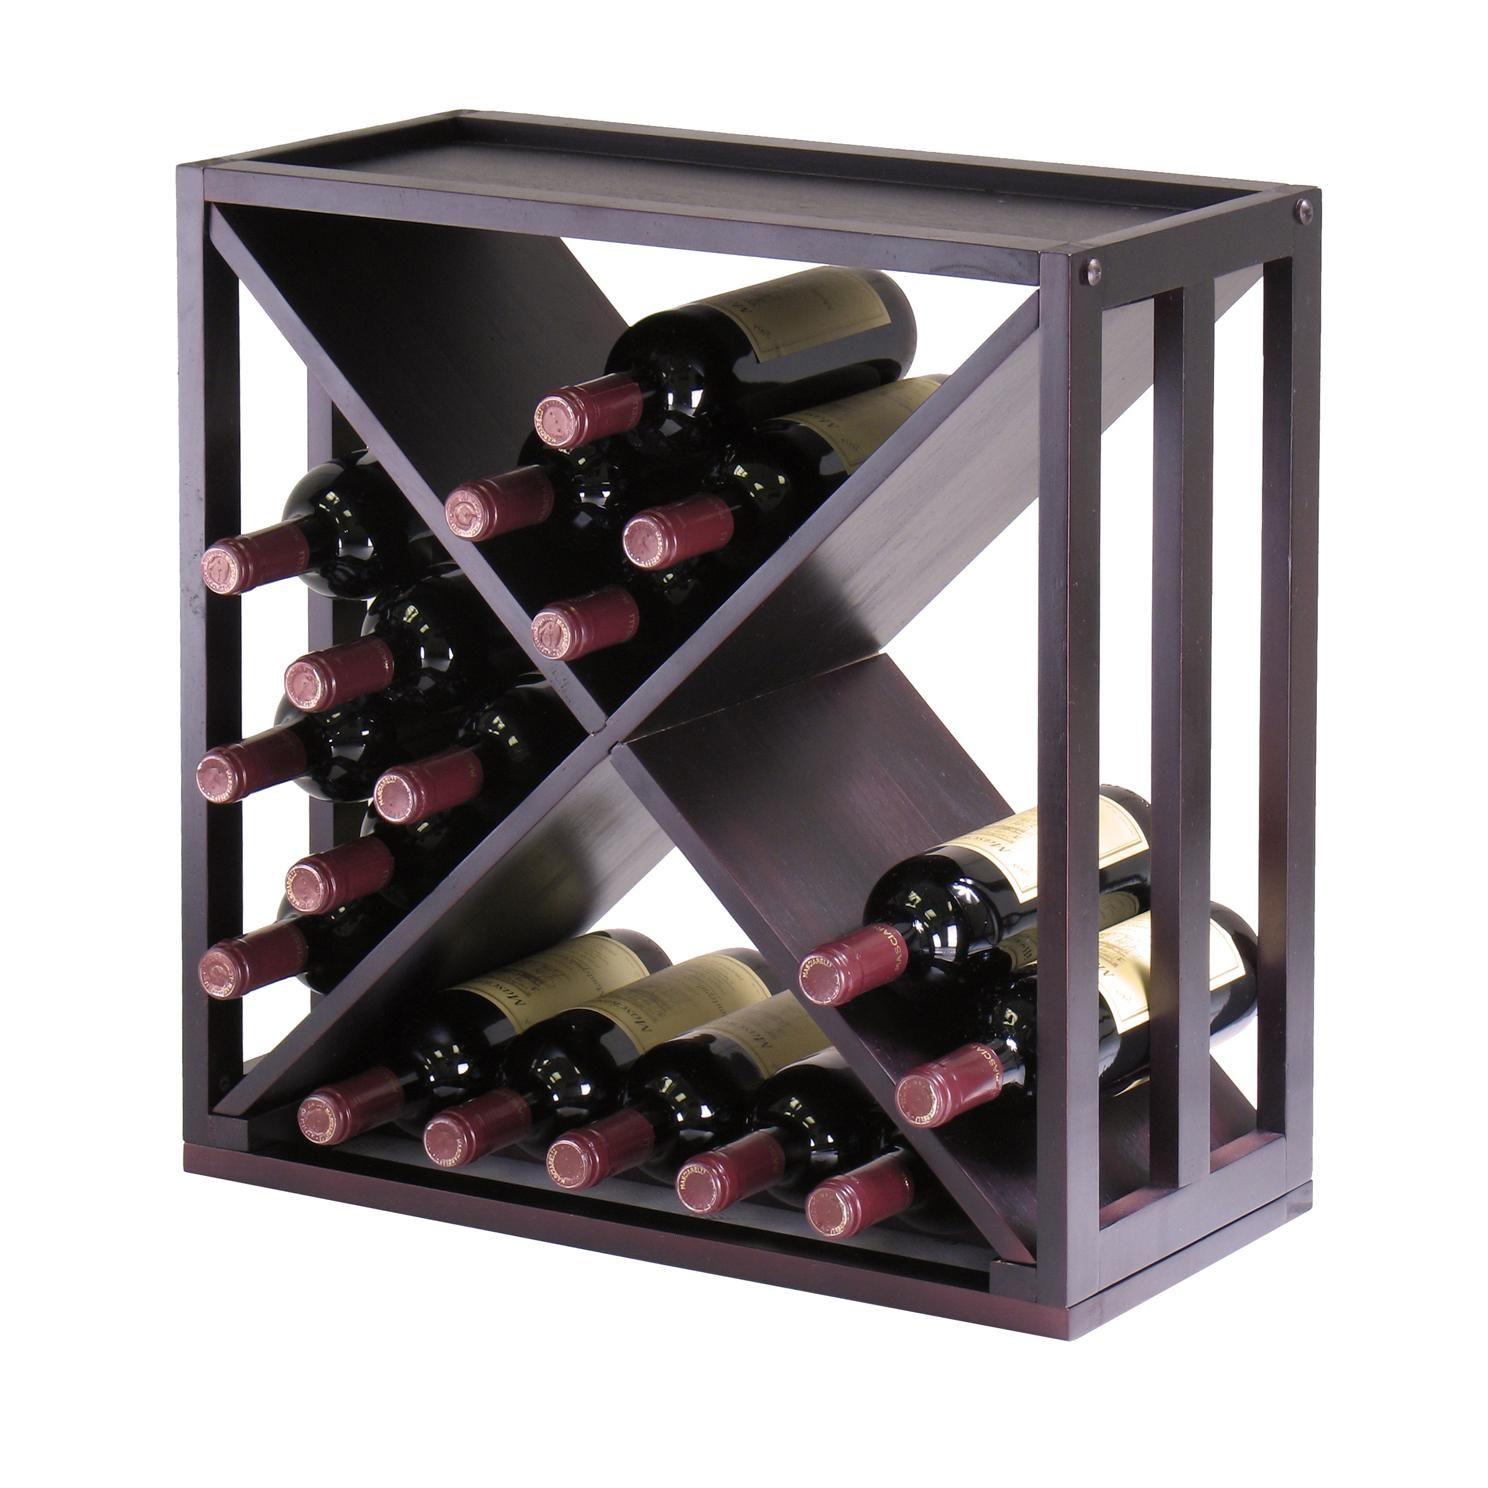 Amazon.com Winsome Wood Kingston  X -Design Wine Storage Cube  sc 1 st  Pinterest & Amazon.com: Winsome Wood Kingston